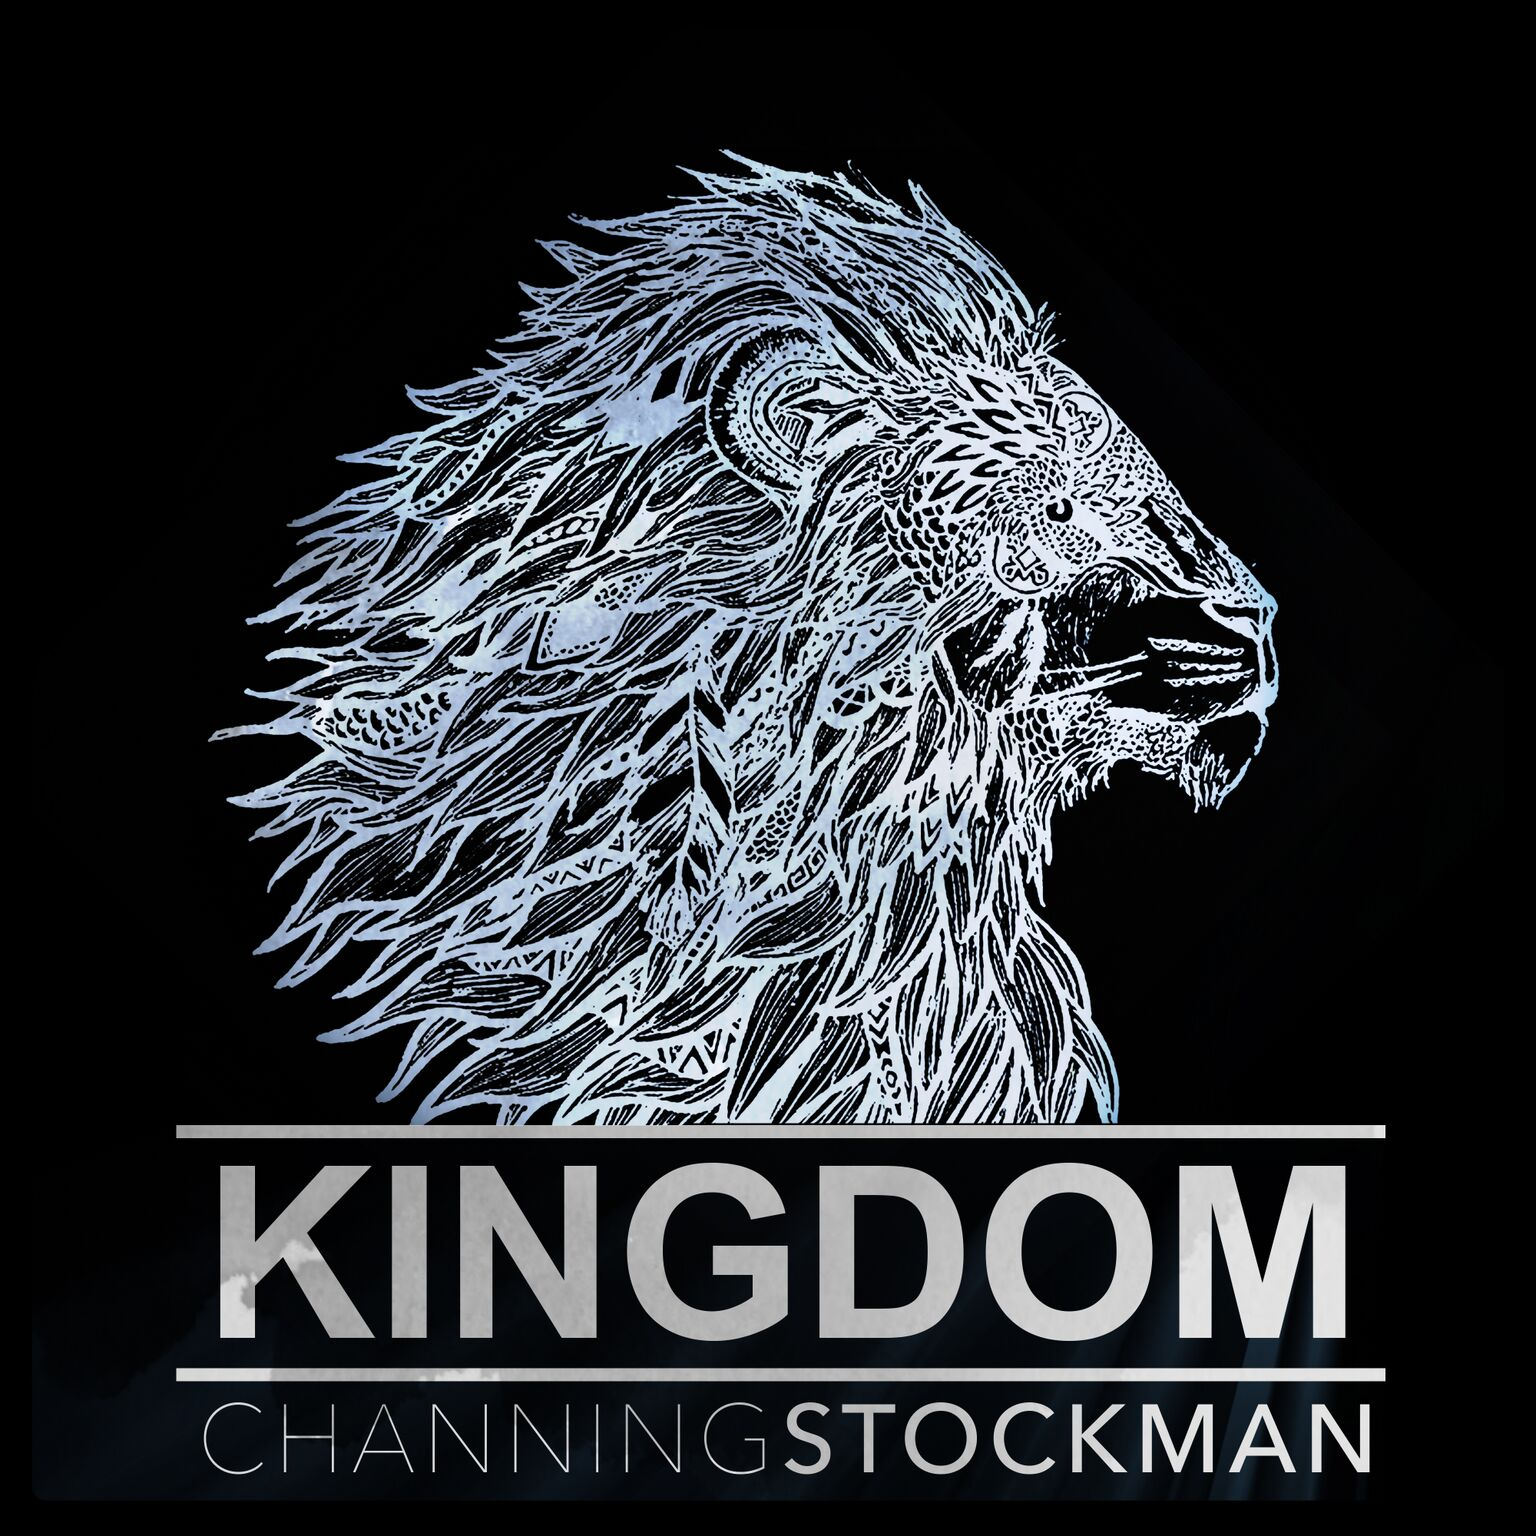 KingdomAlbumArt (0;00;00;21) (0;00;03;17).jpg